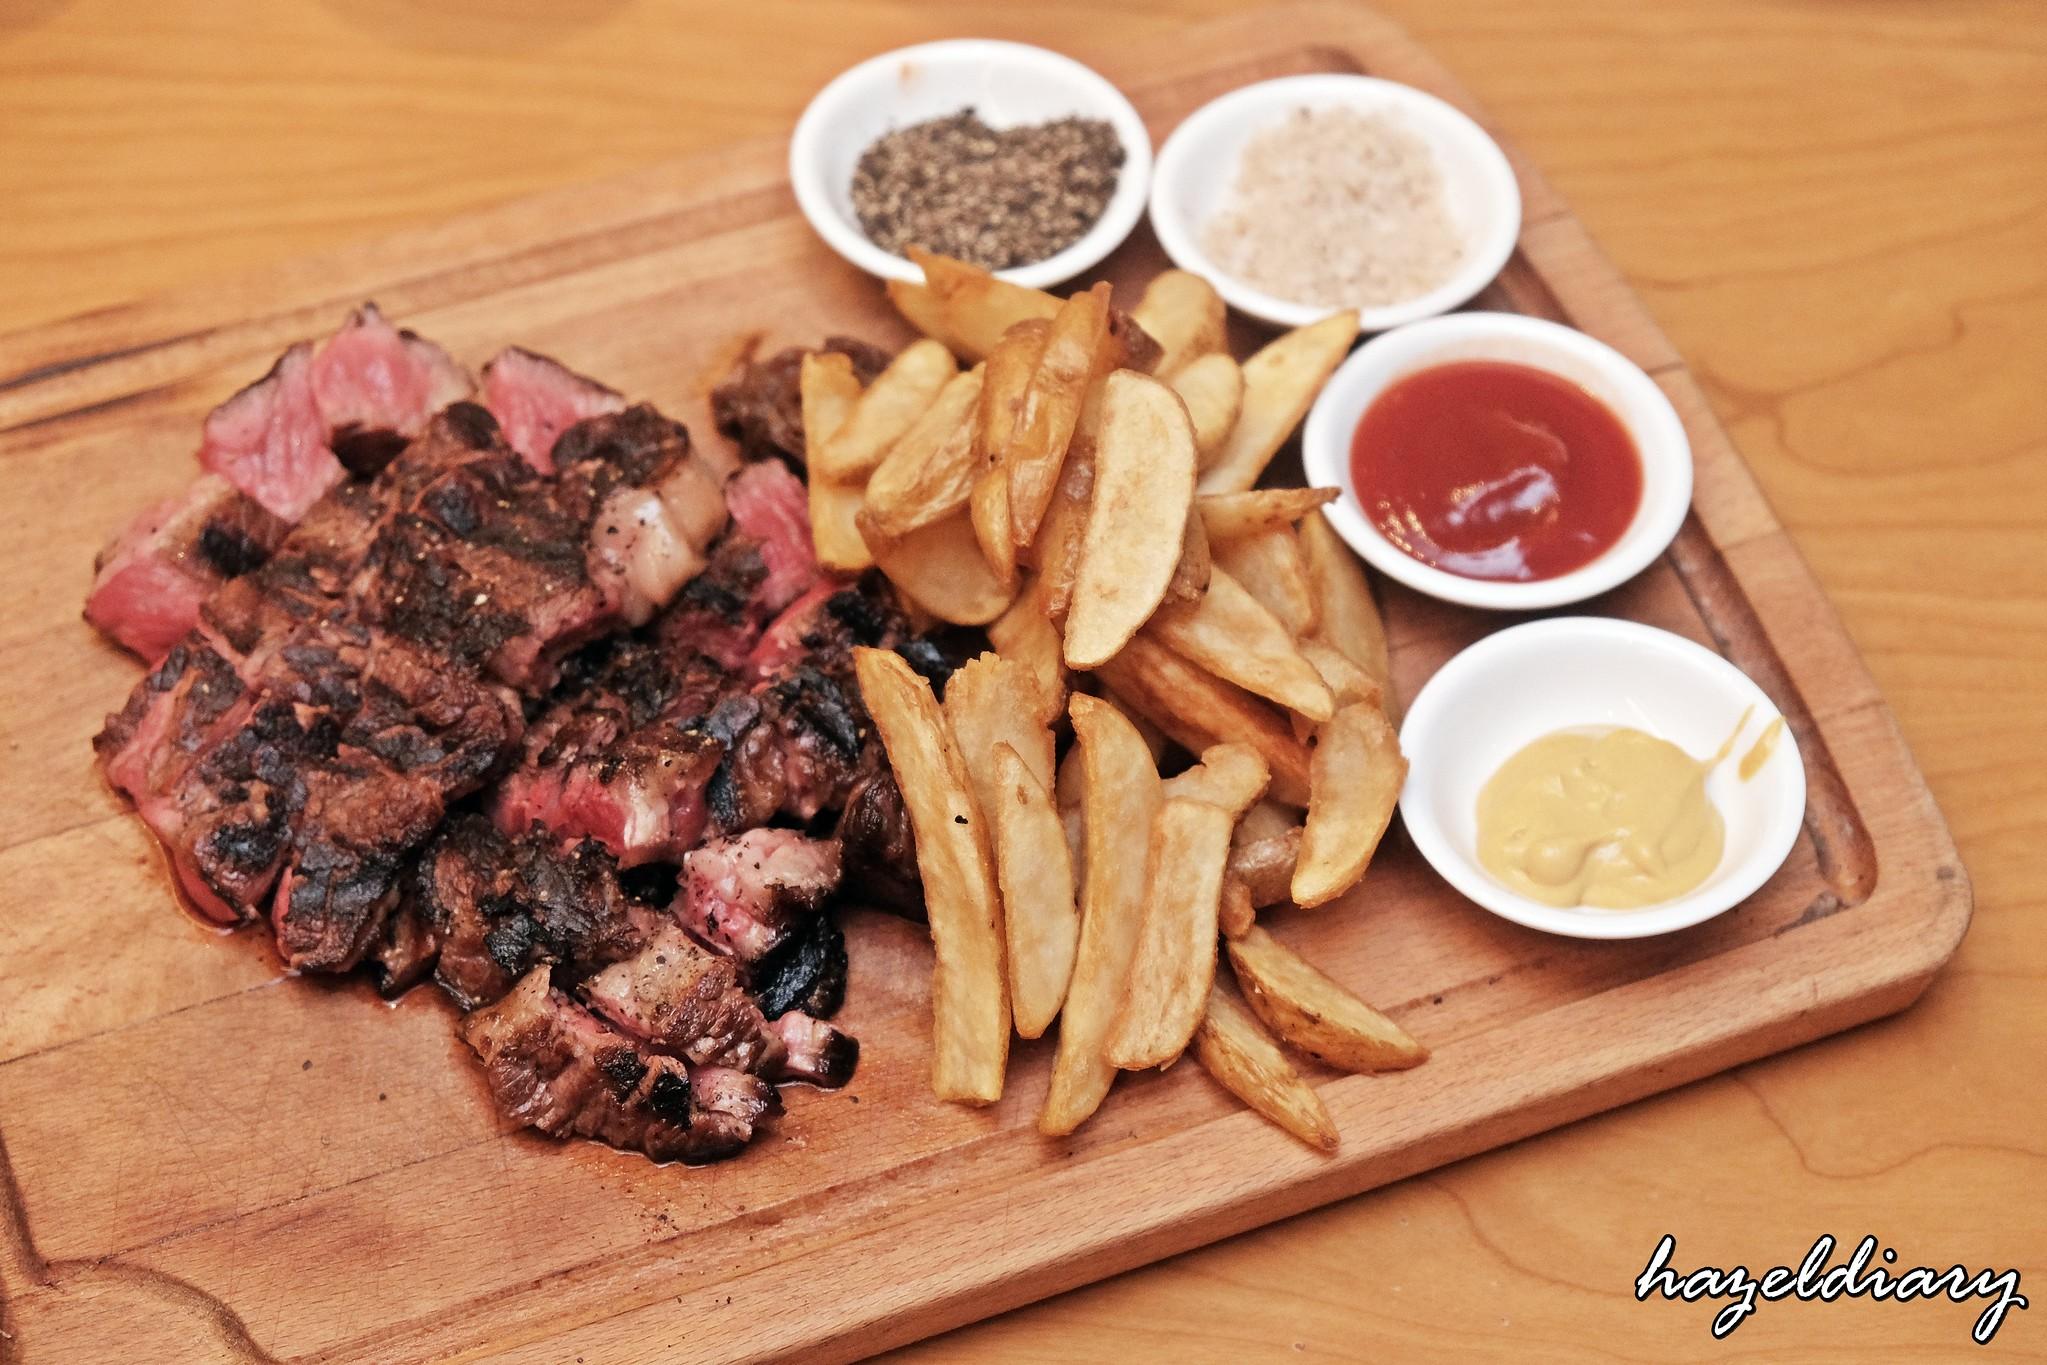 New Ubin Seafood Zhongshan Park-Black Angus Ribeye